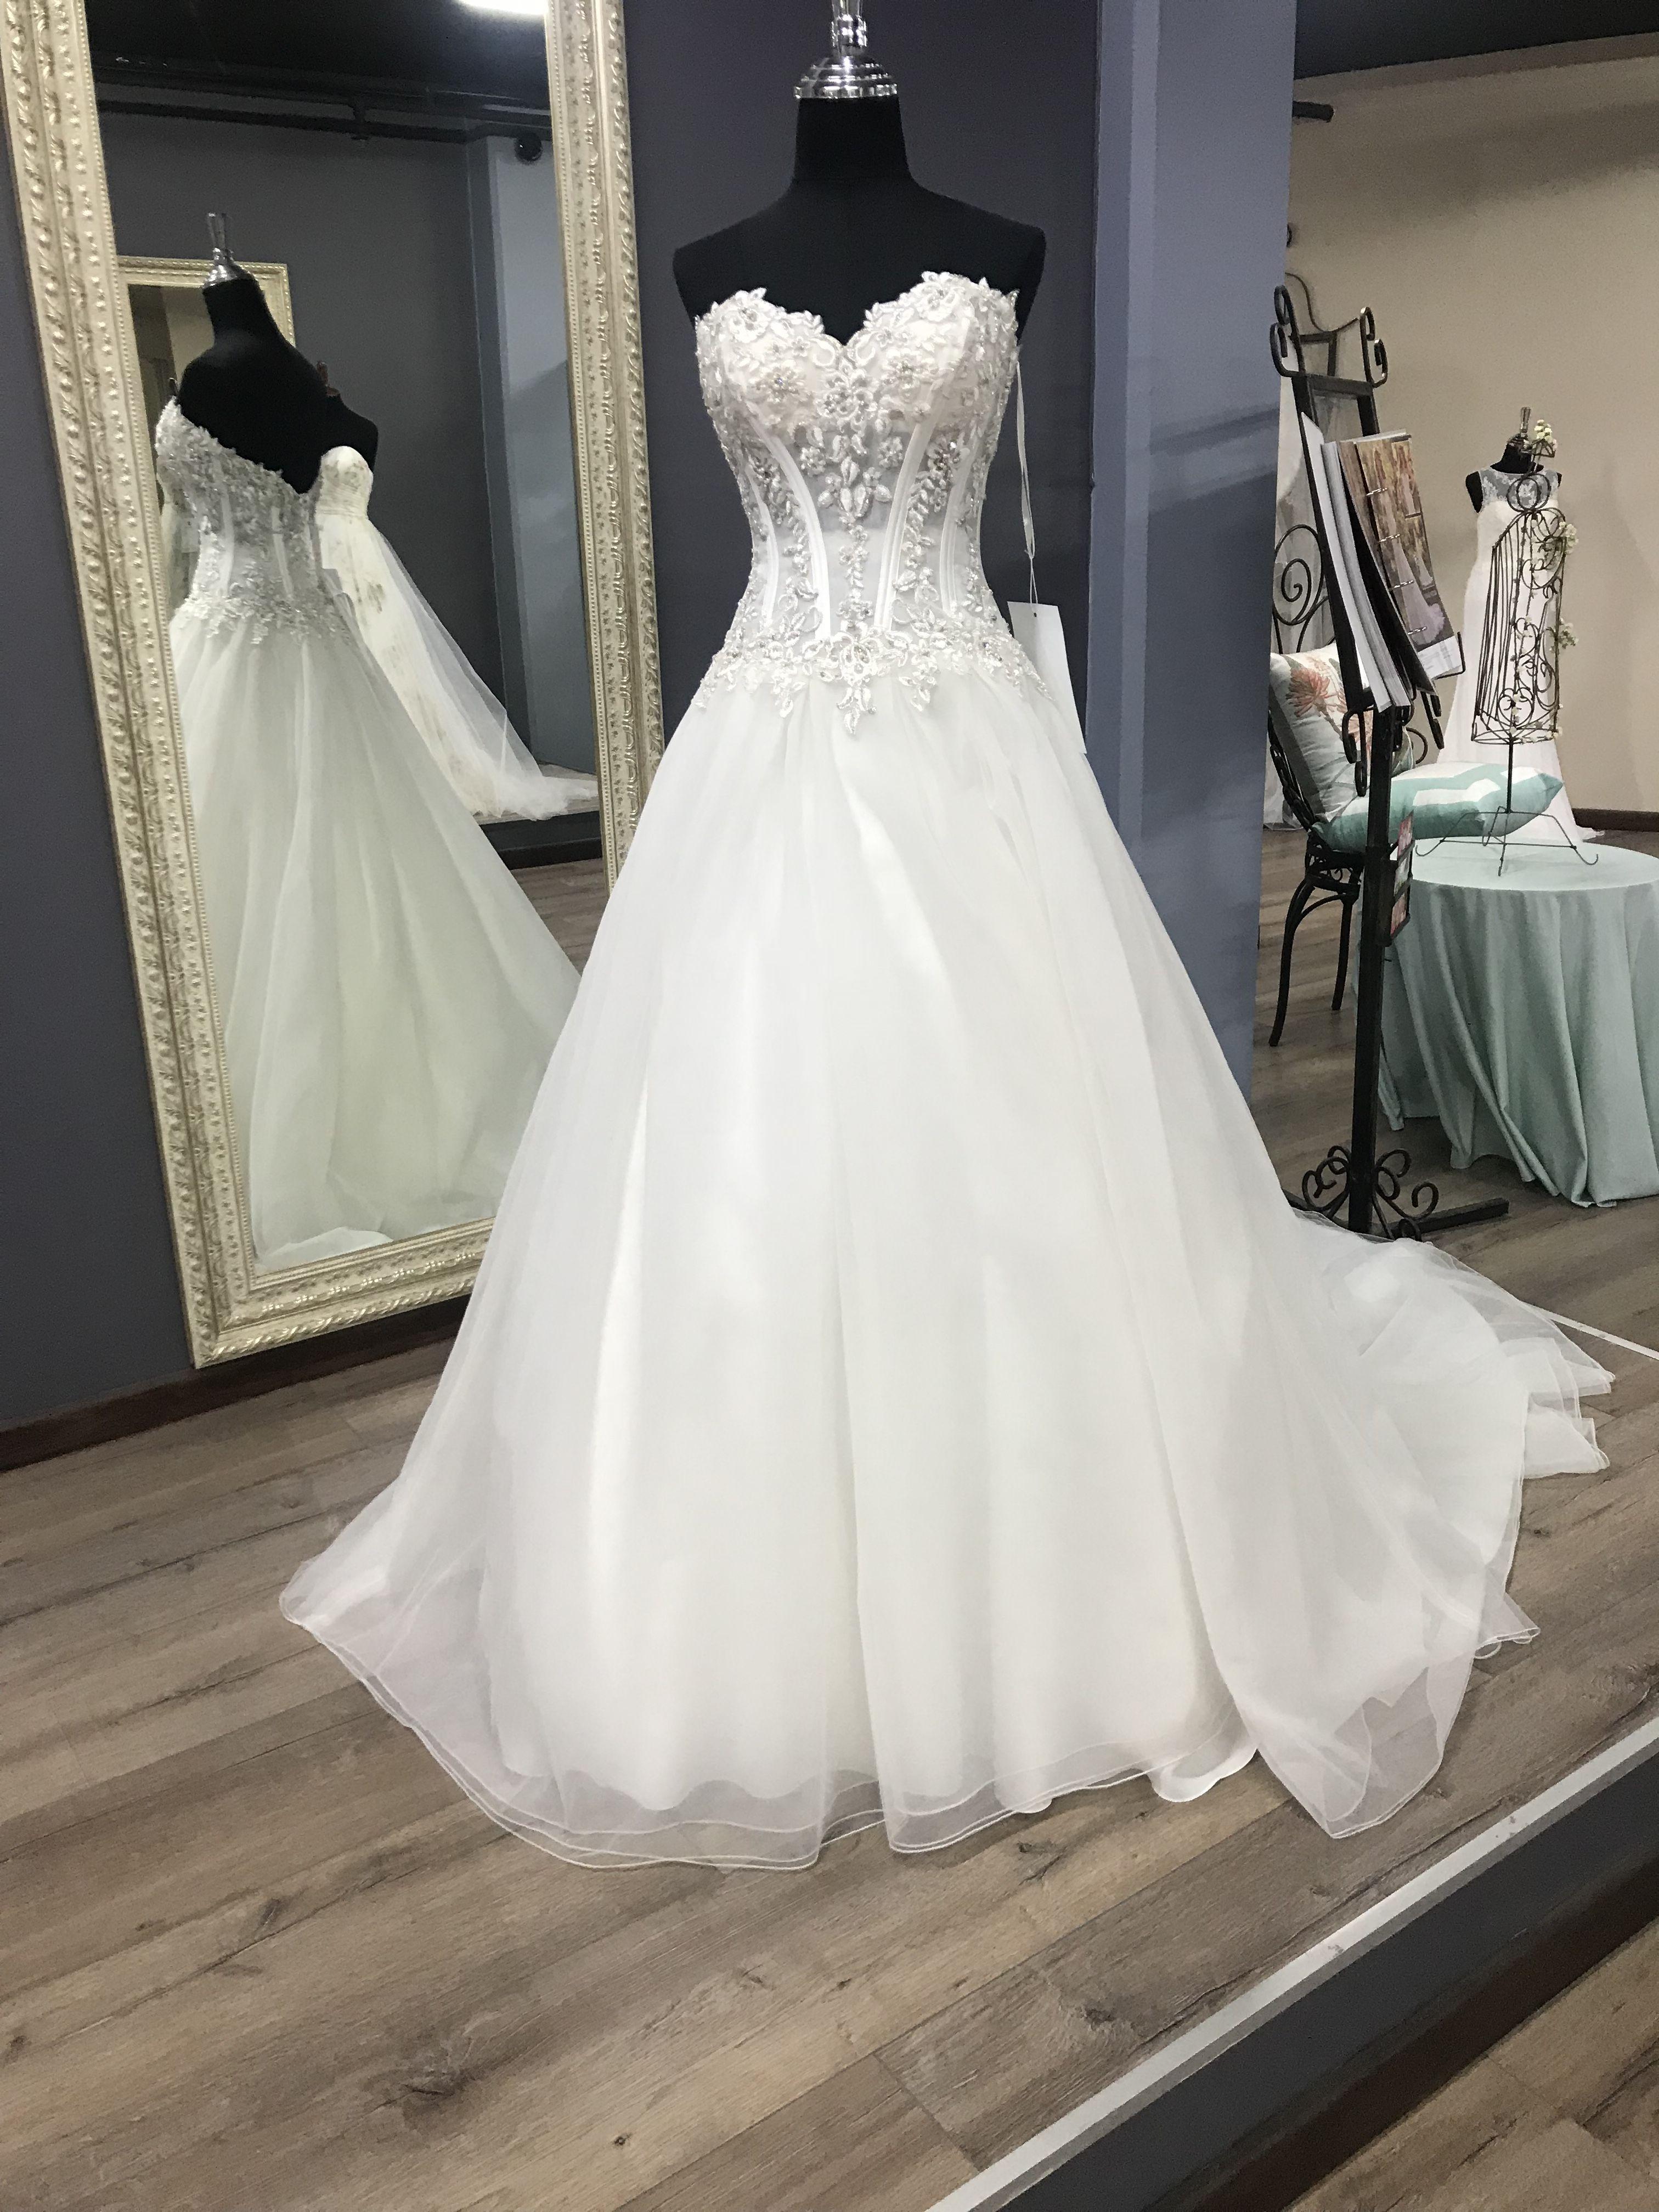 Weddingdress beautiful weddingbells marriage bridetobe